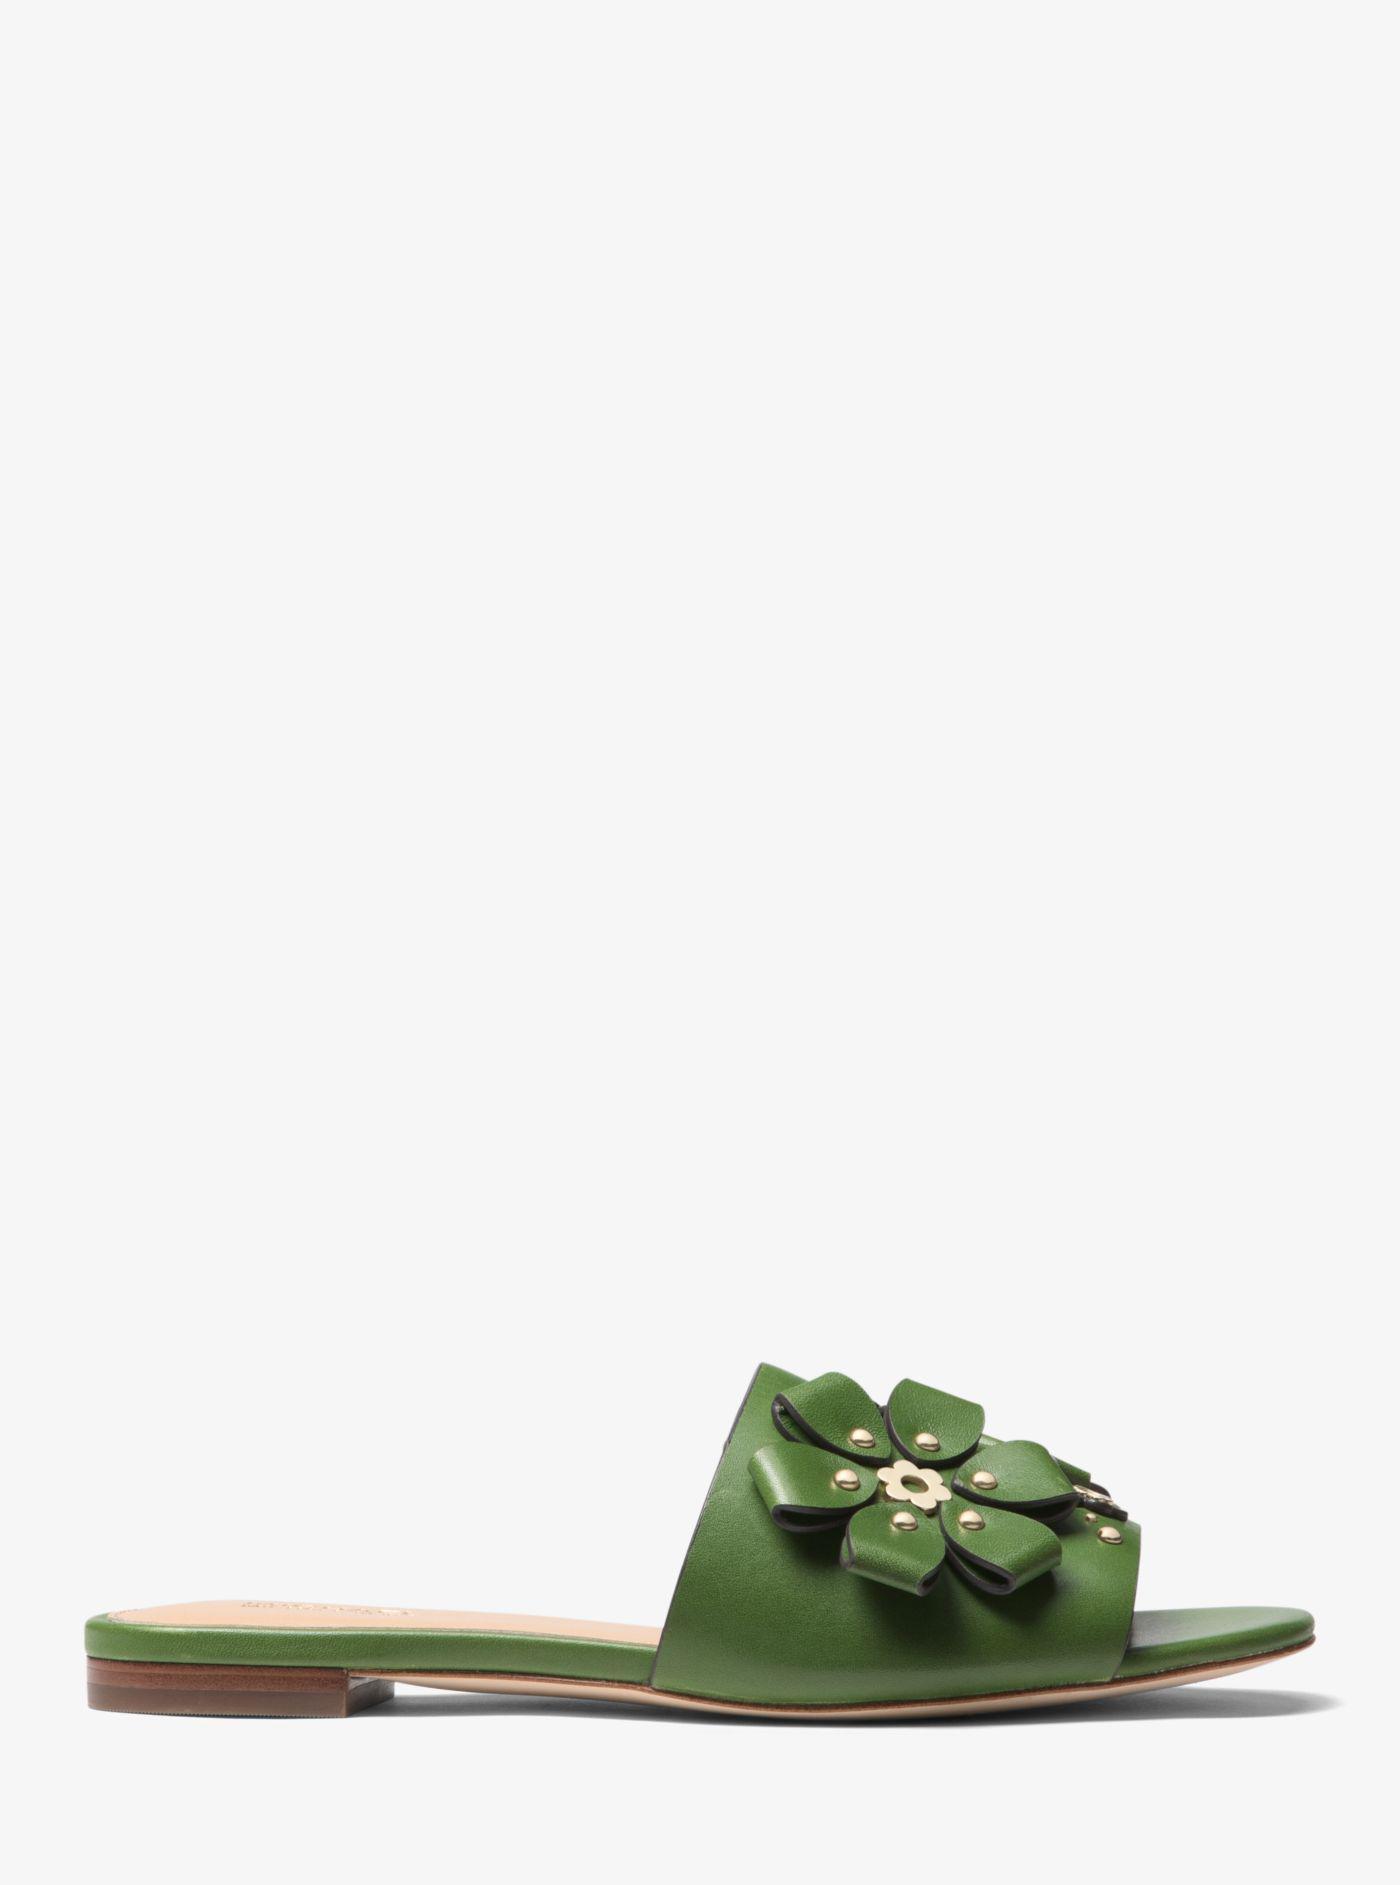 83a2c5c427c Michael Kors Tara Floral Embellished Leather Slide in Green - Lyst